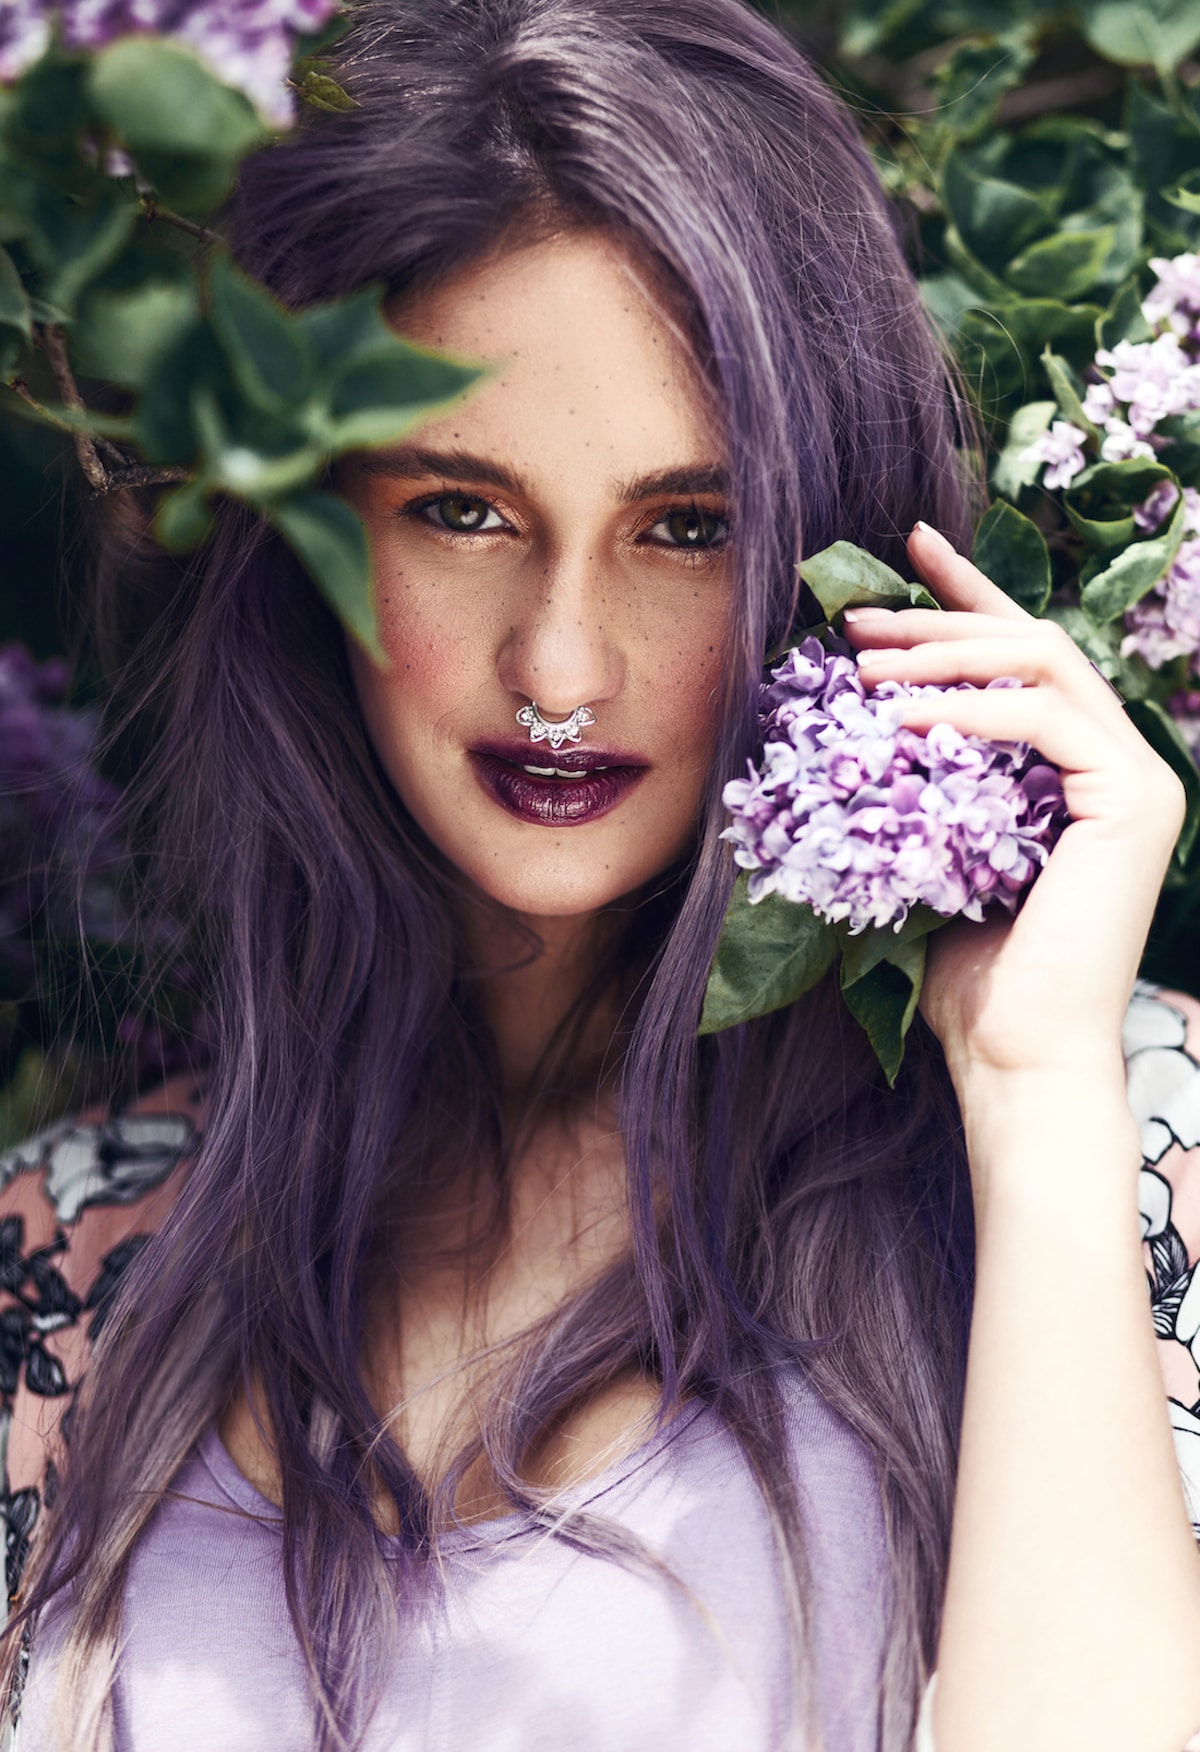 Warna rambut ungu keabuan - ash purple violet